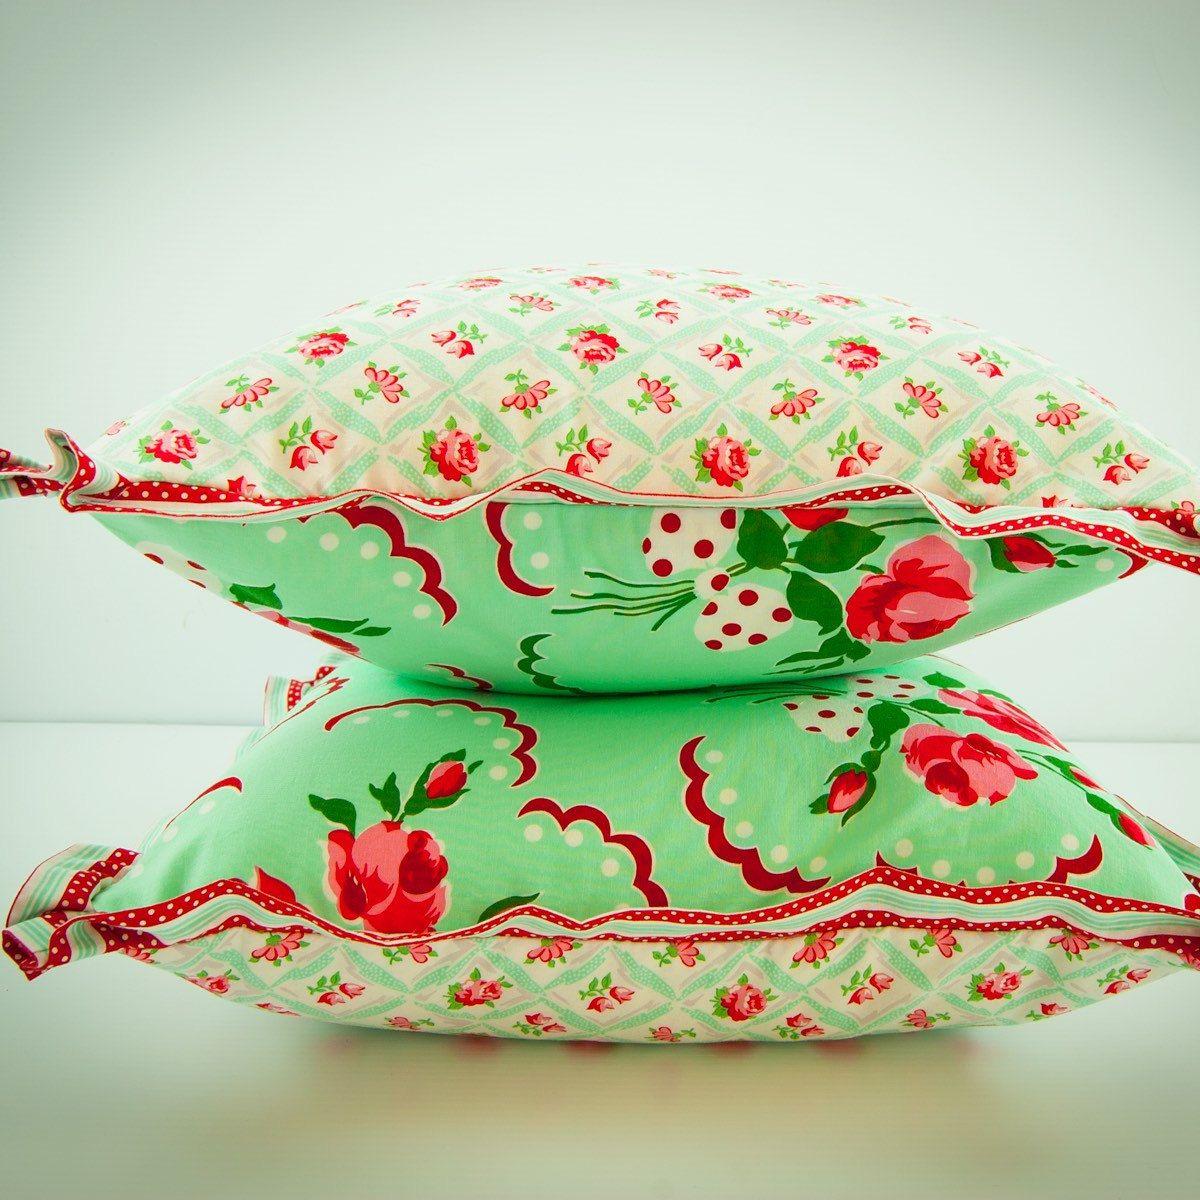 Retro children's pillow cover in mint!